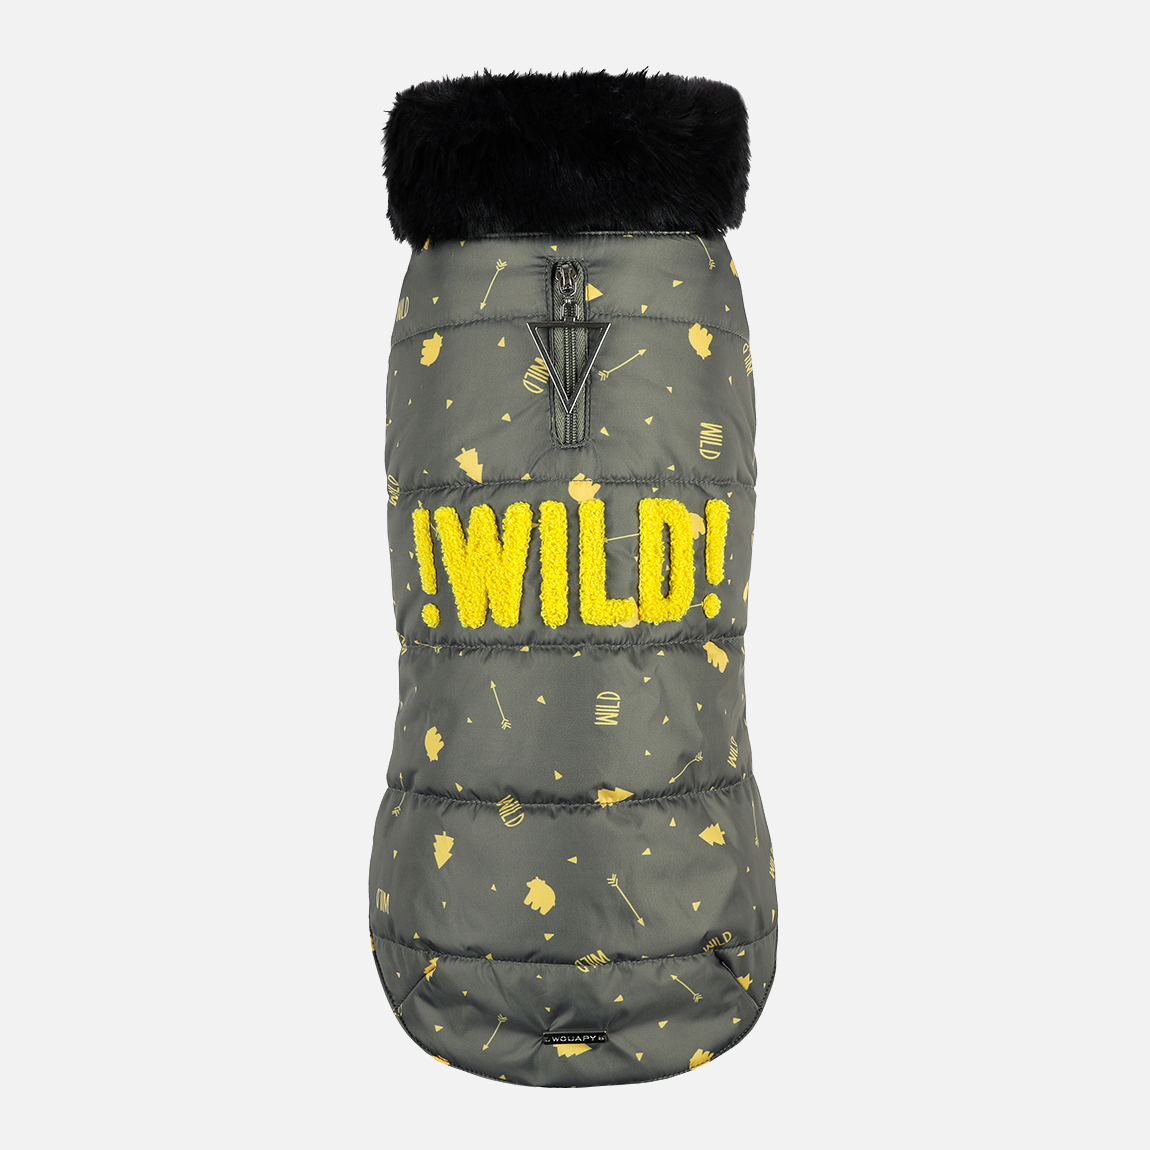 Manteaux fantaisies wild kaki par Wouapy